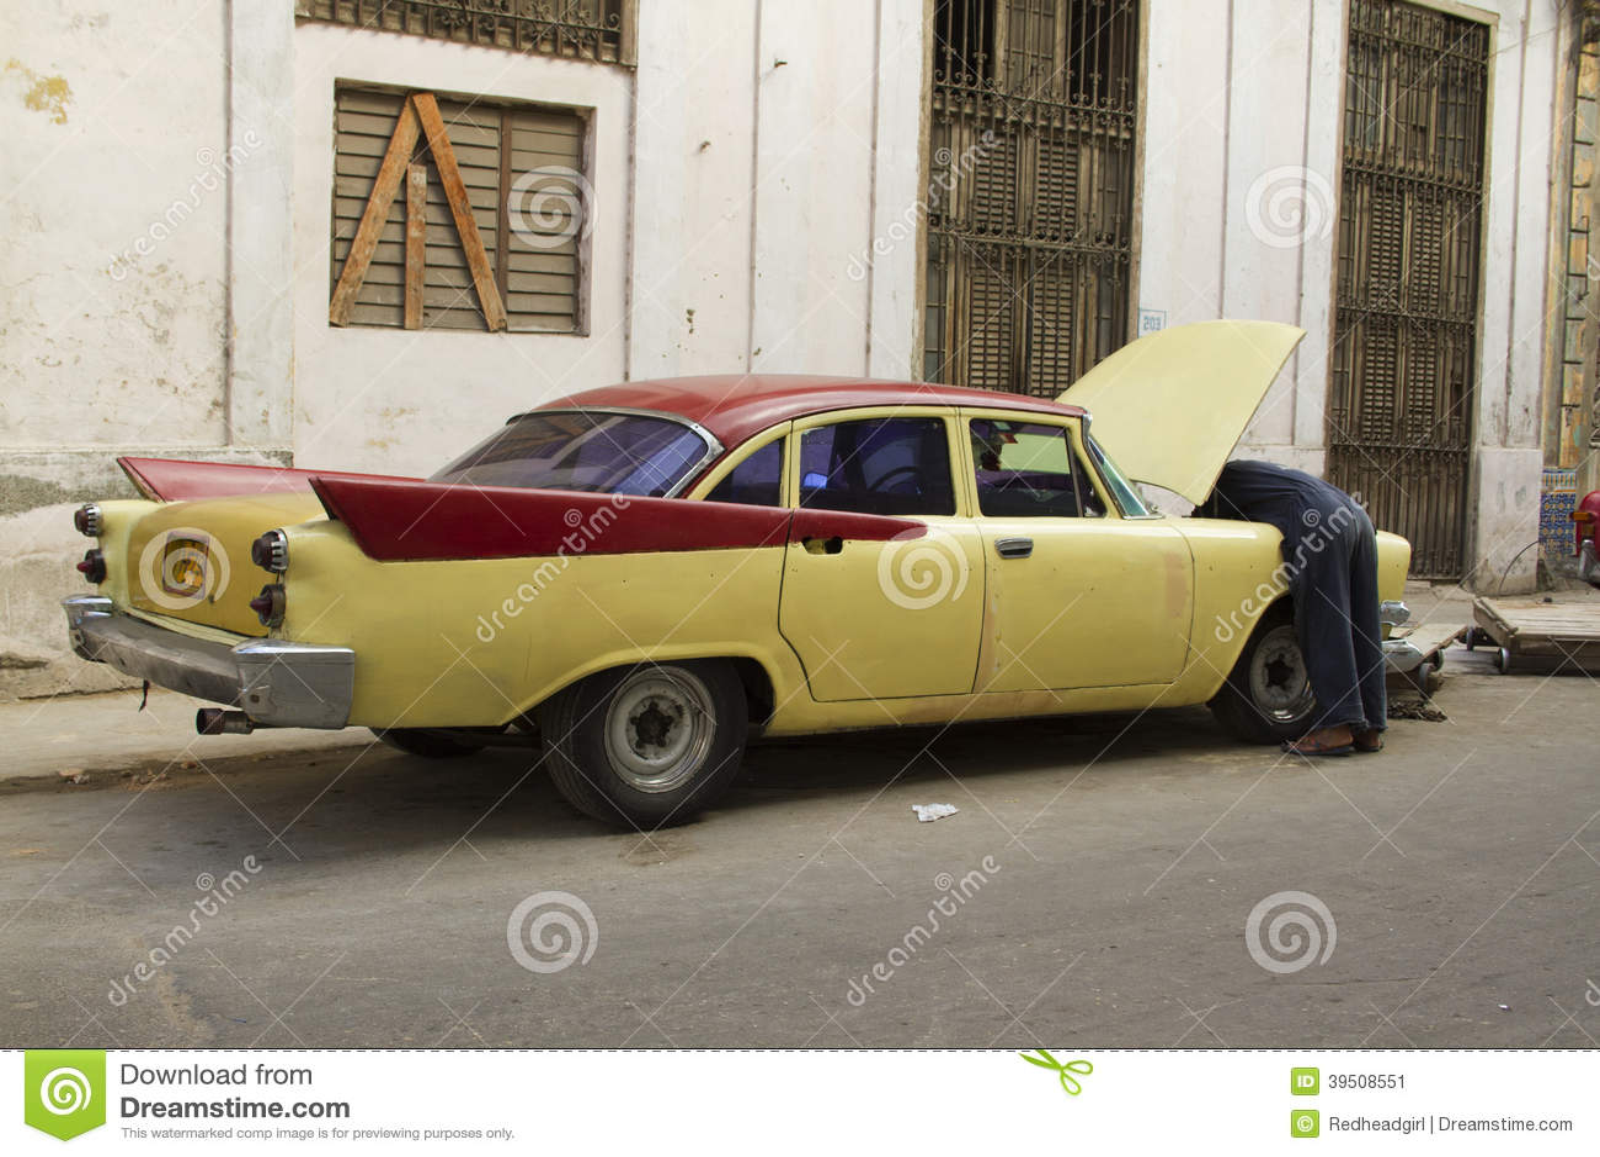 Old vintage Yellow Cuban Car